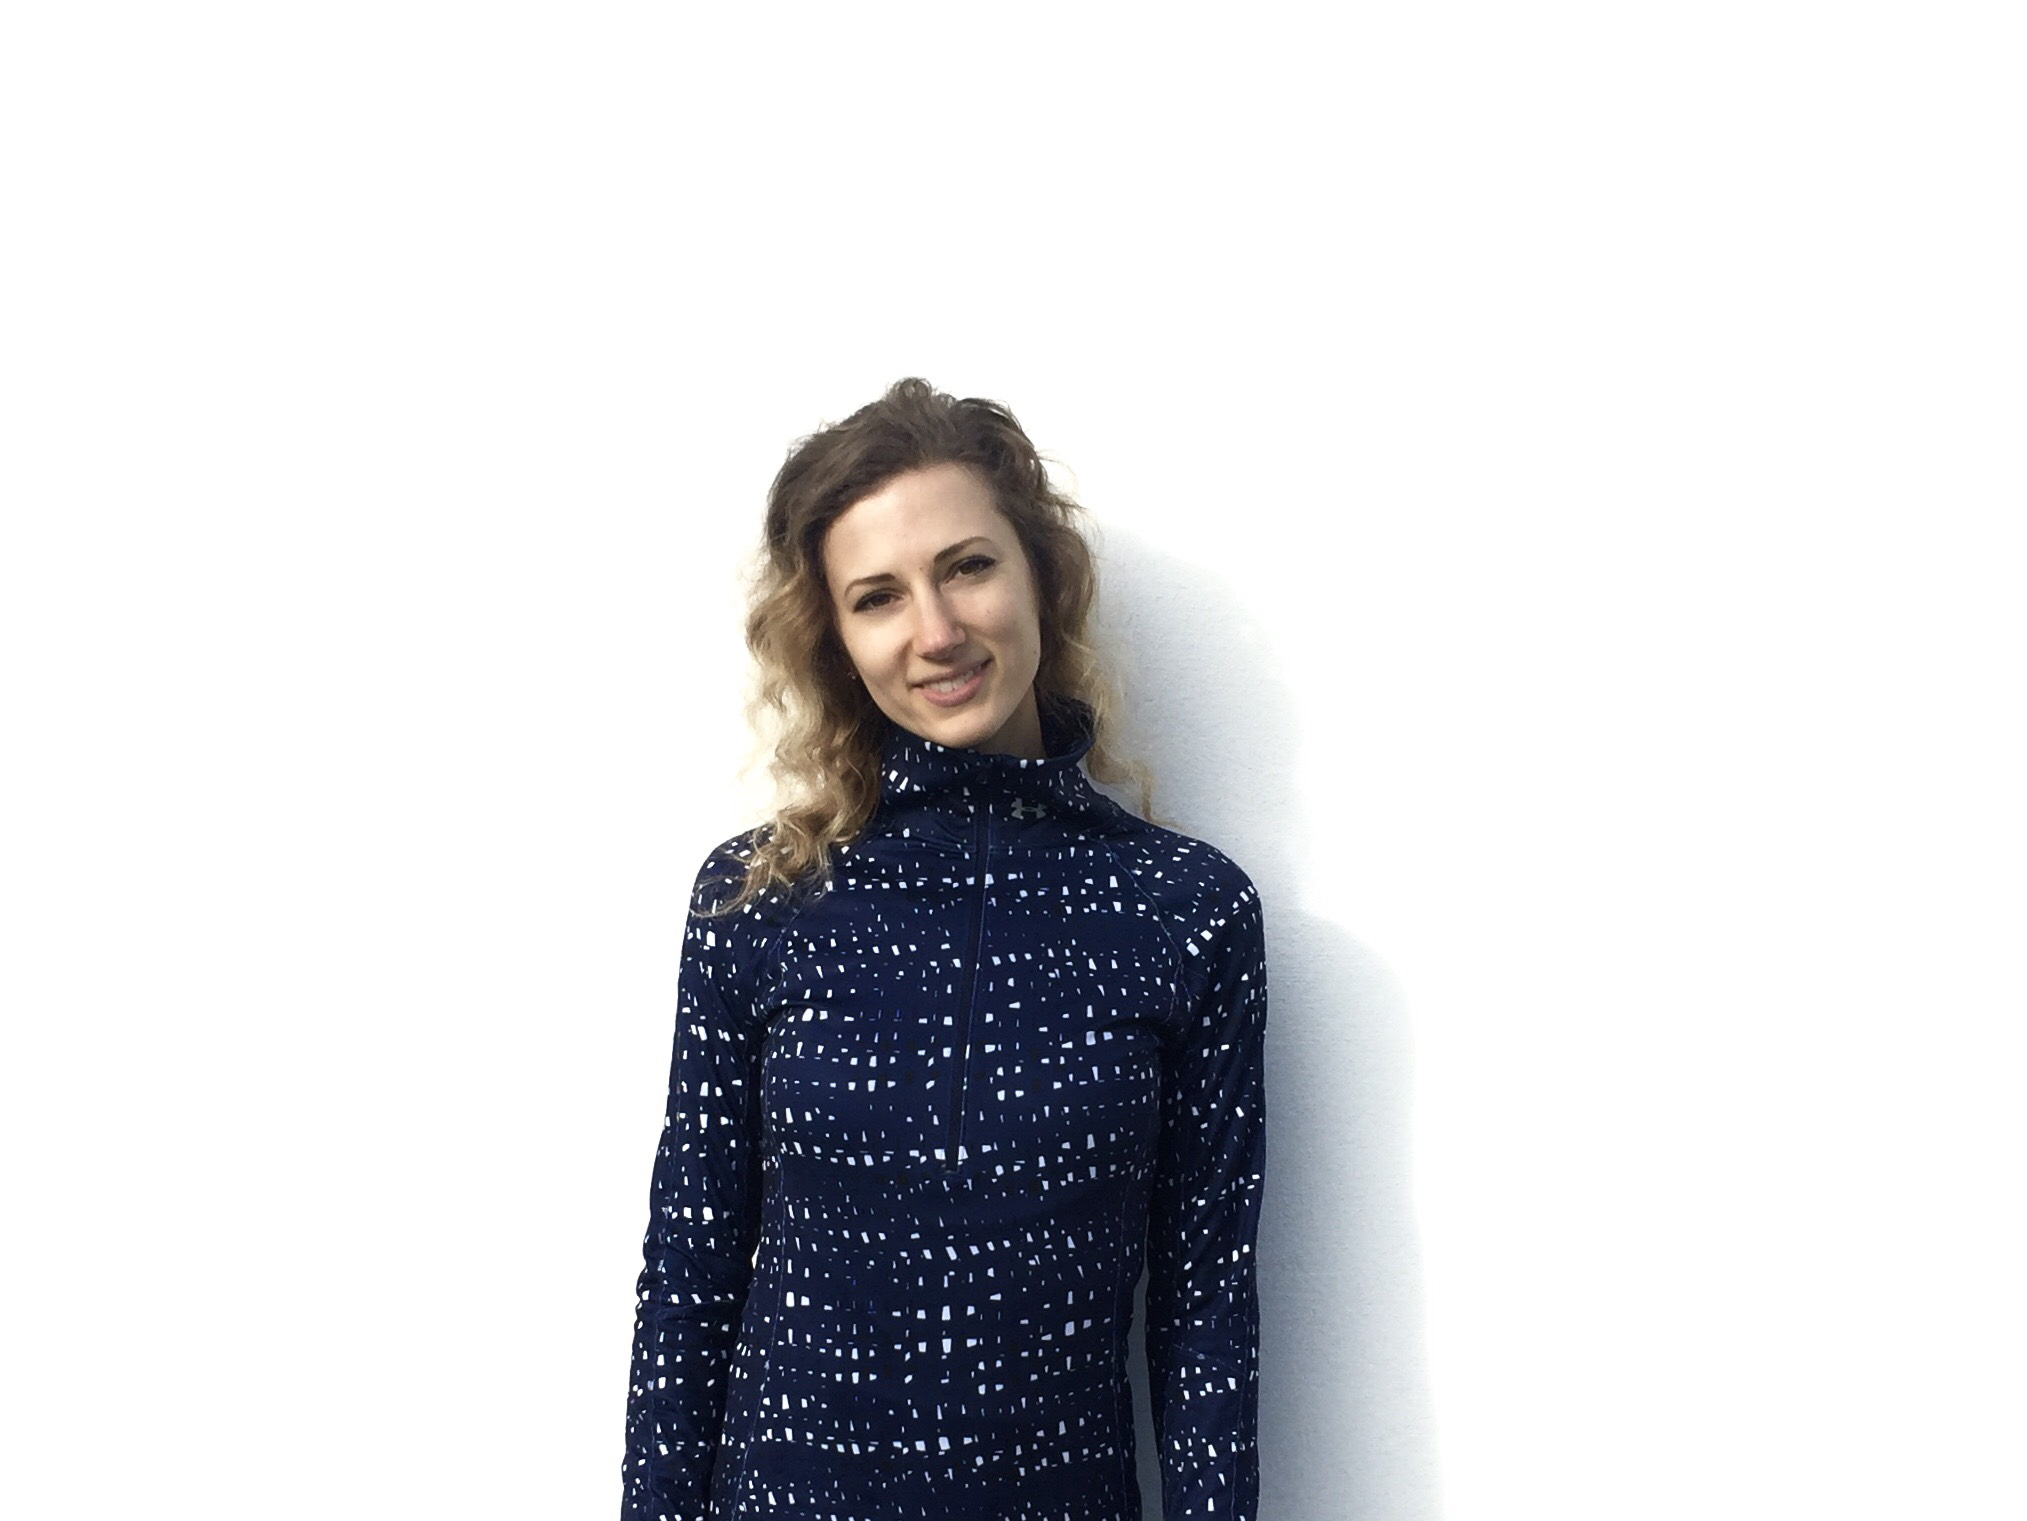 New blog contributor Alina Stakhovich